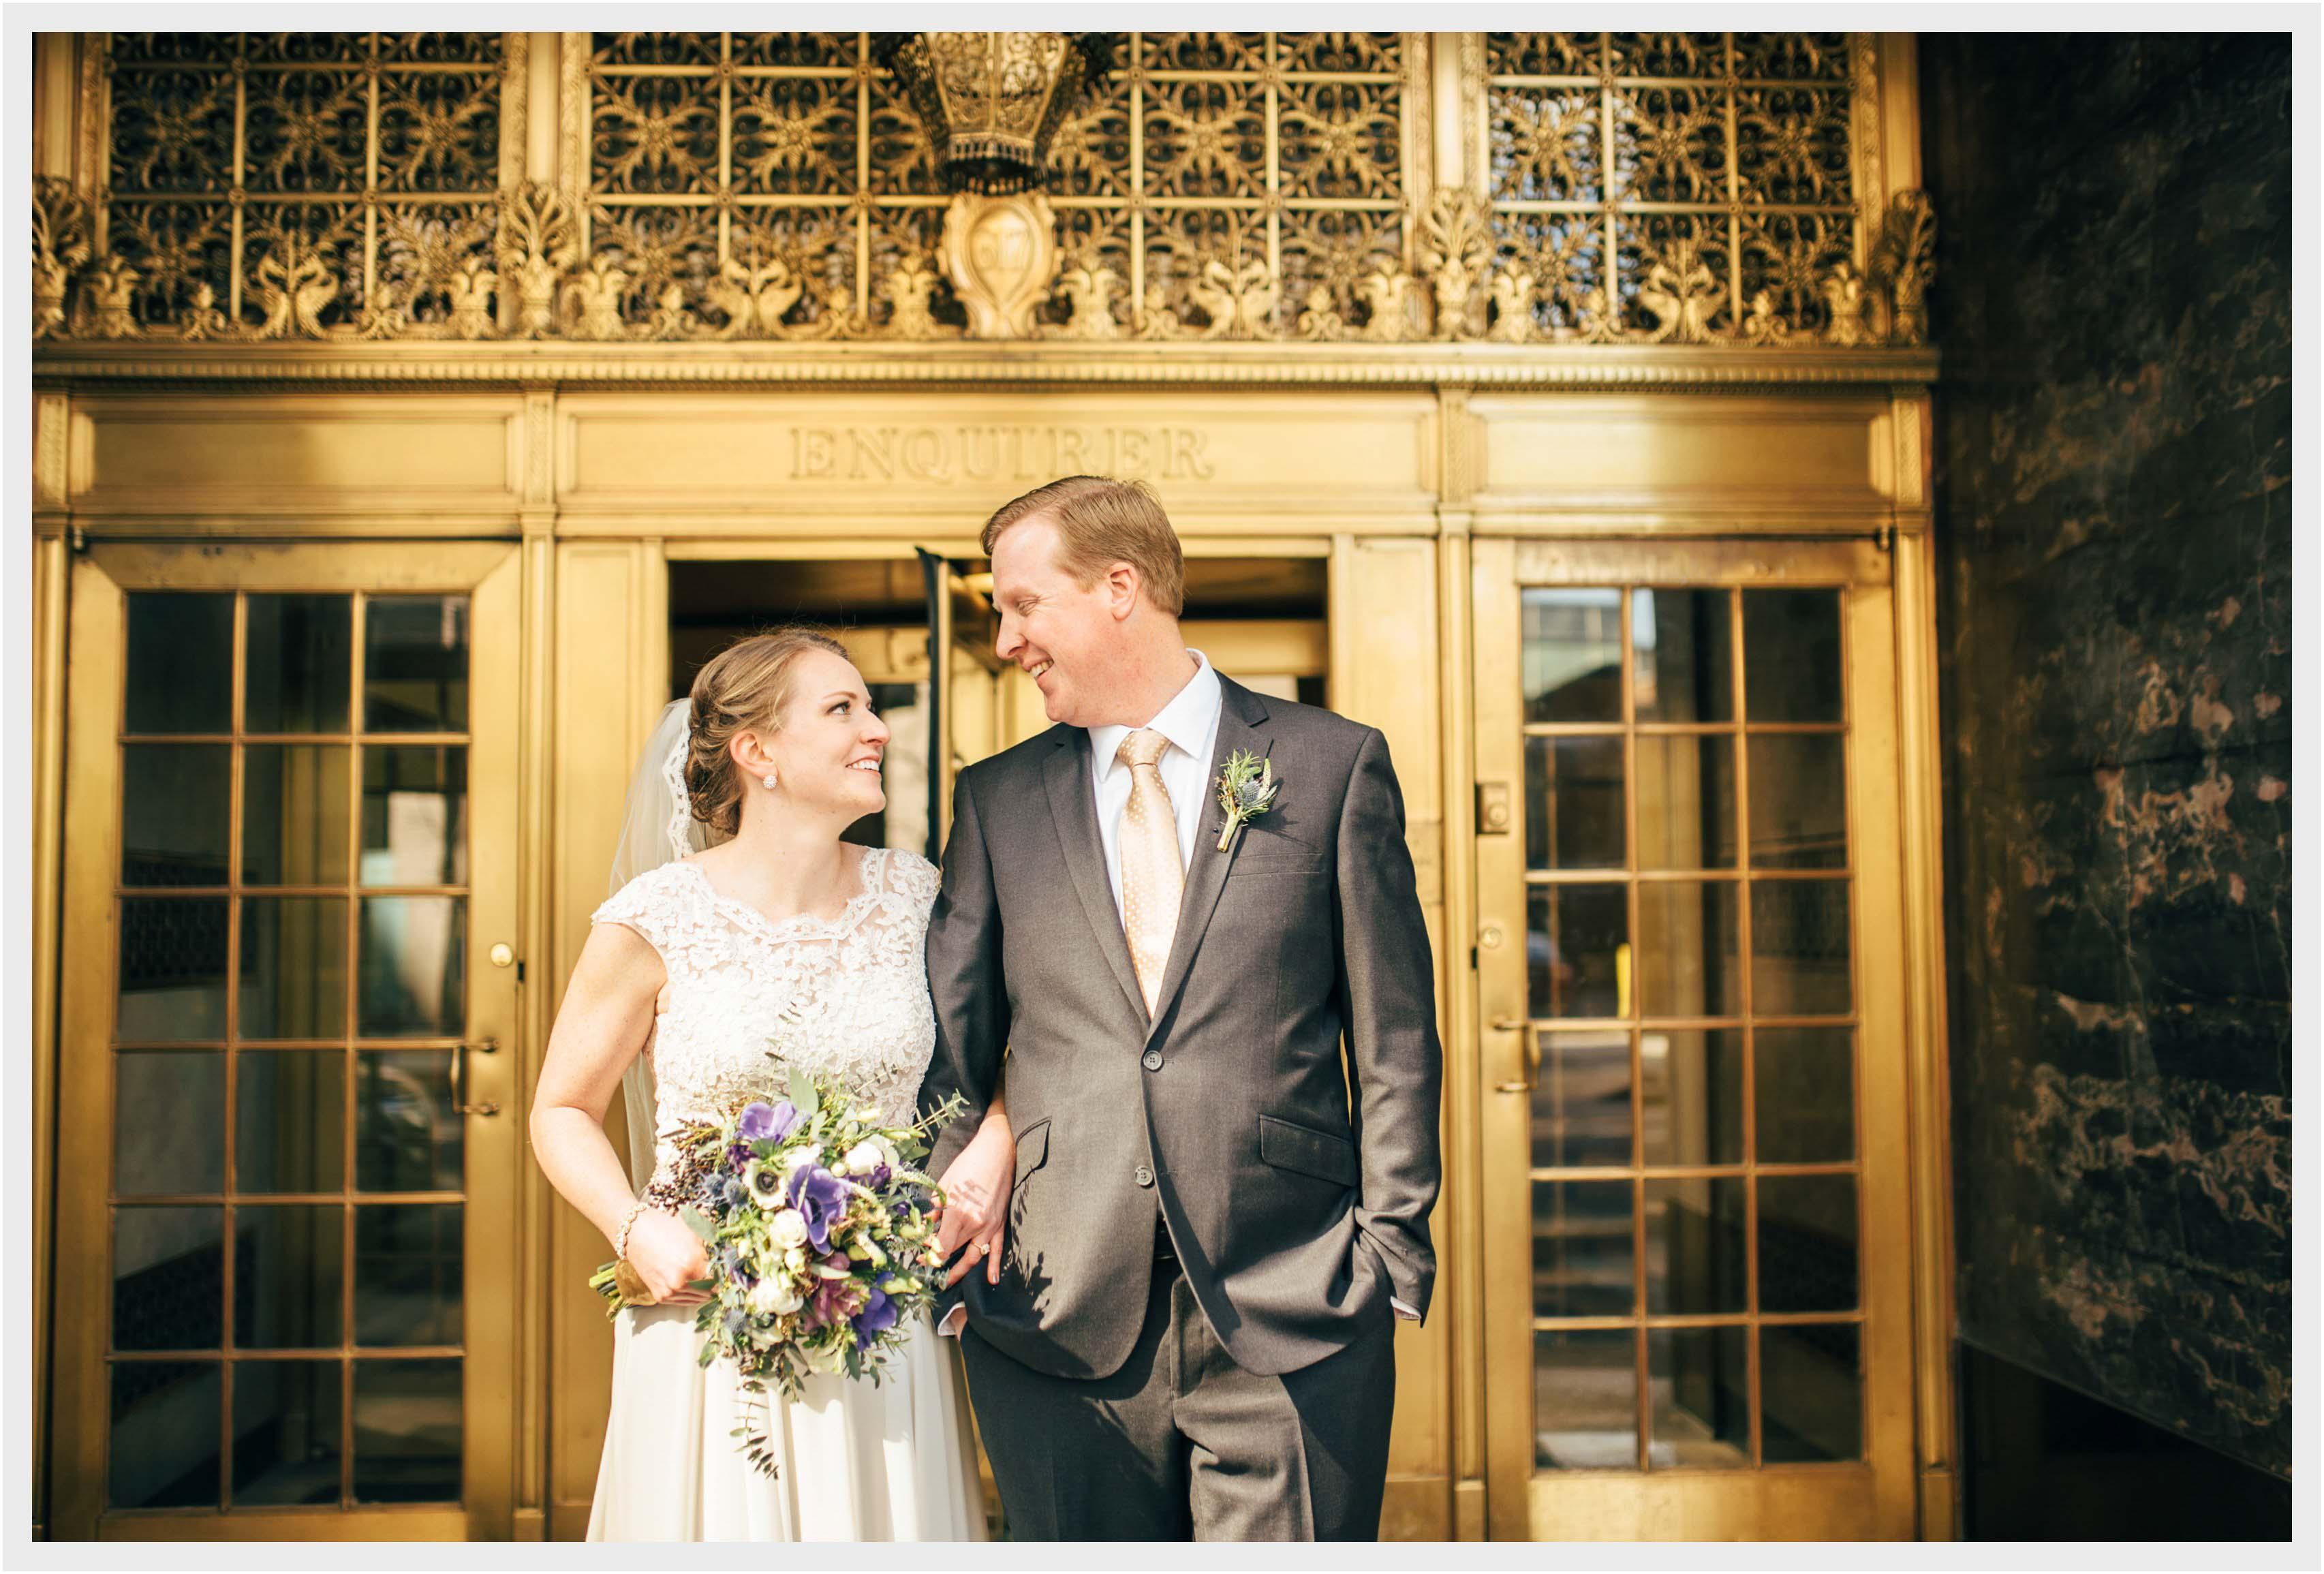 Rhinegeist wedding photos 15